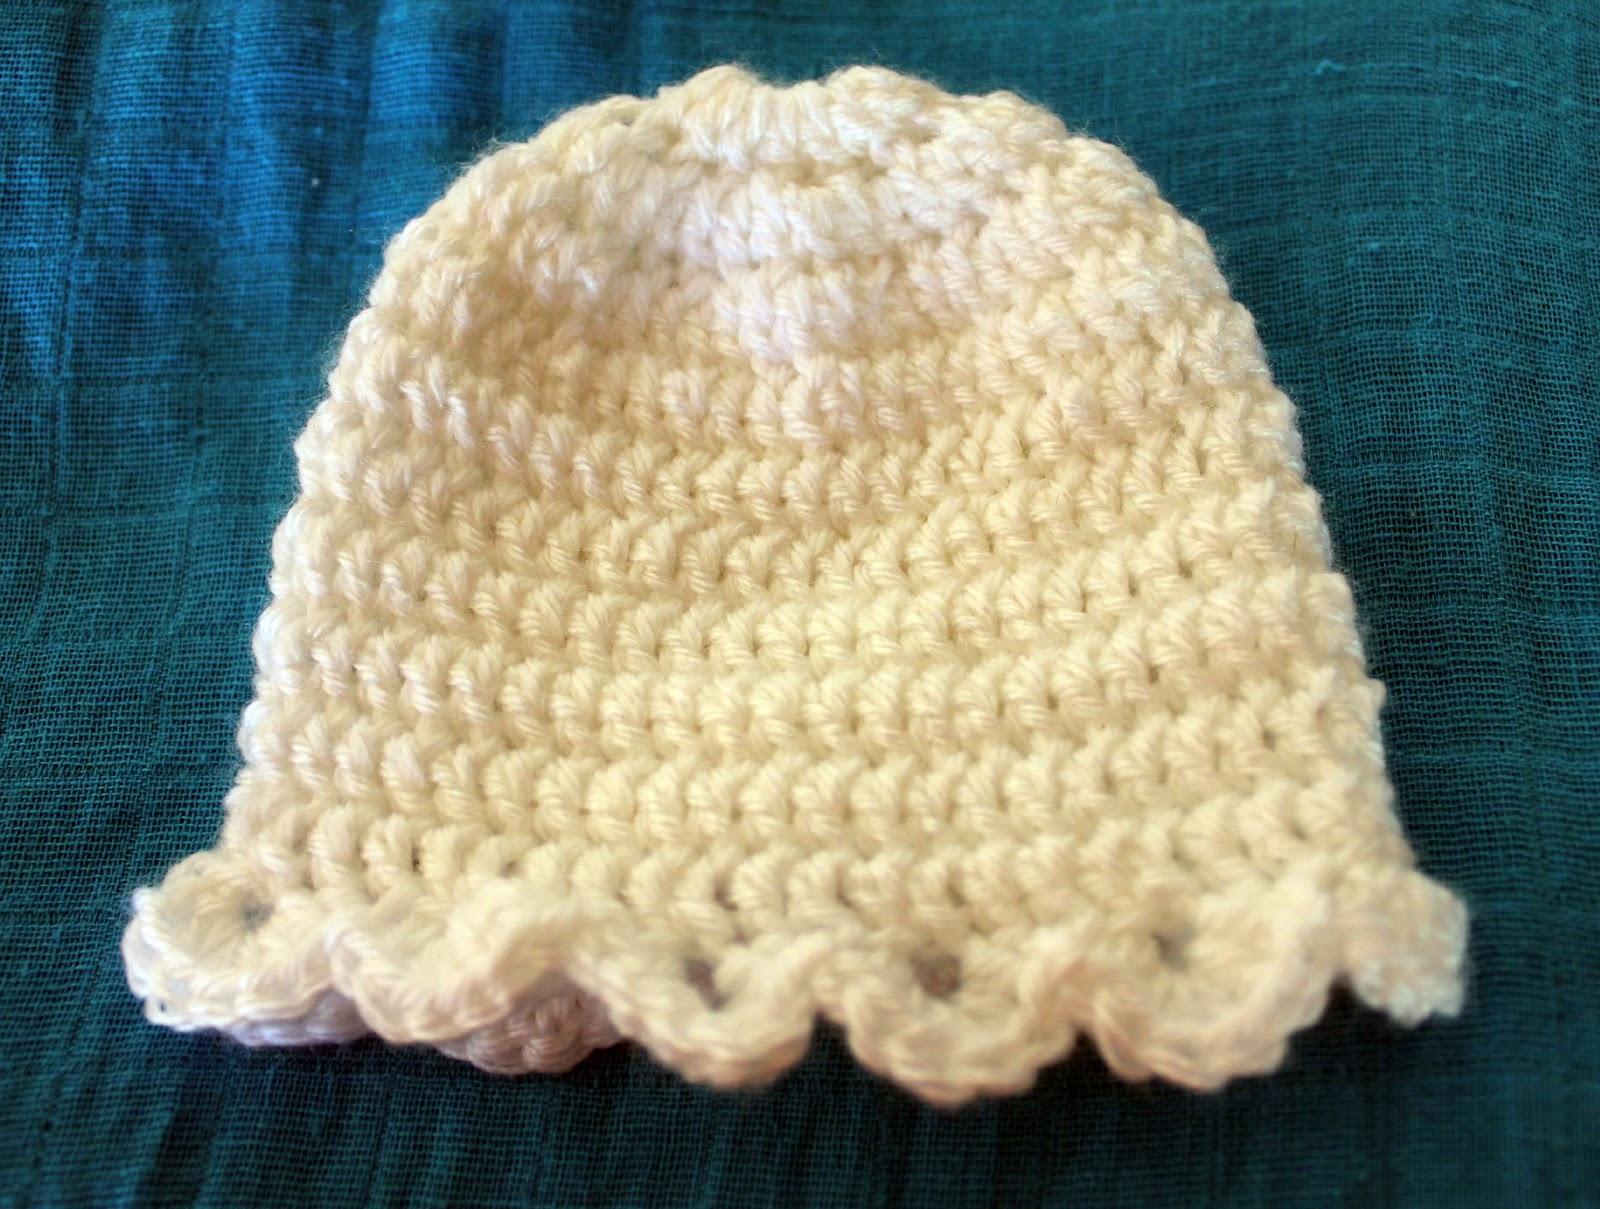 Crochet Beanie Pattern Newborn : Newborn Crochet Beanie Pattern beingfancifullycrafty